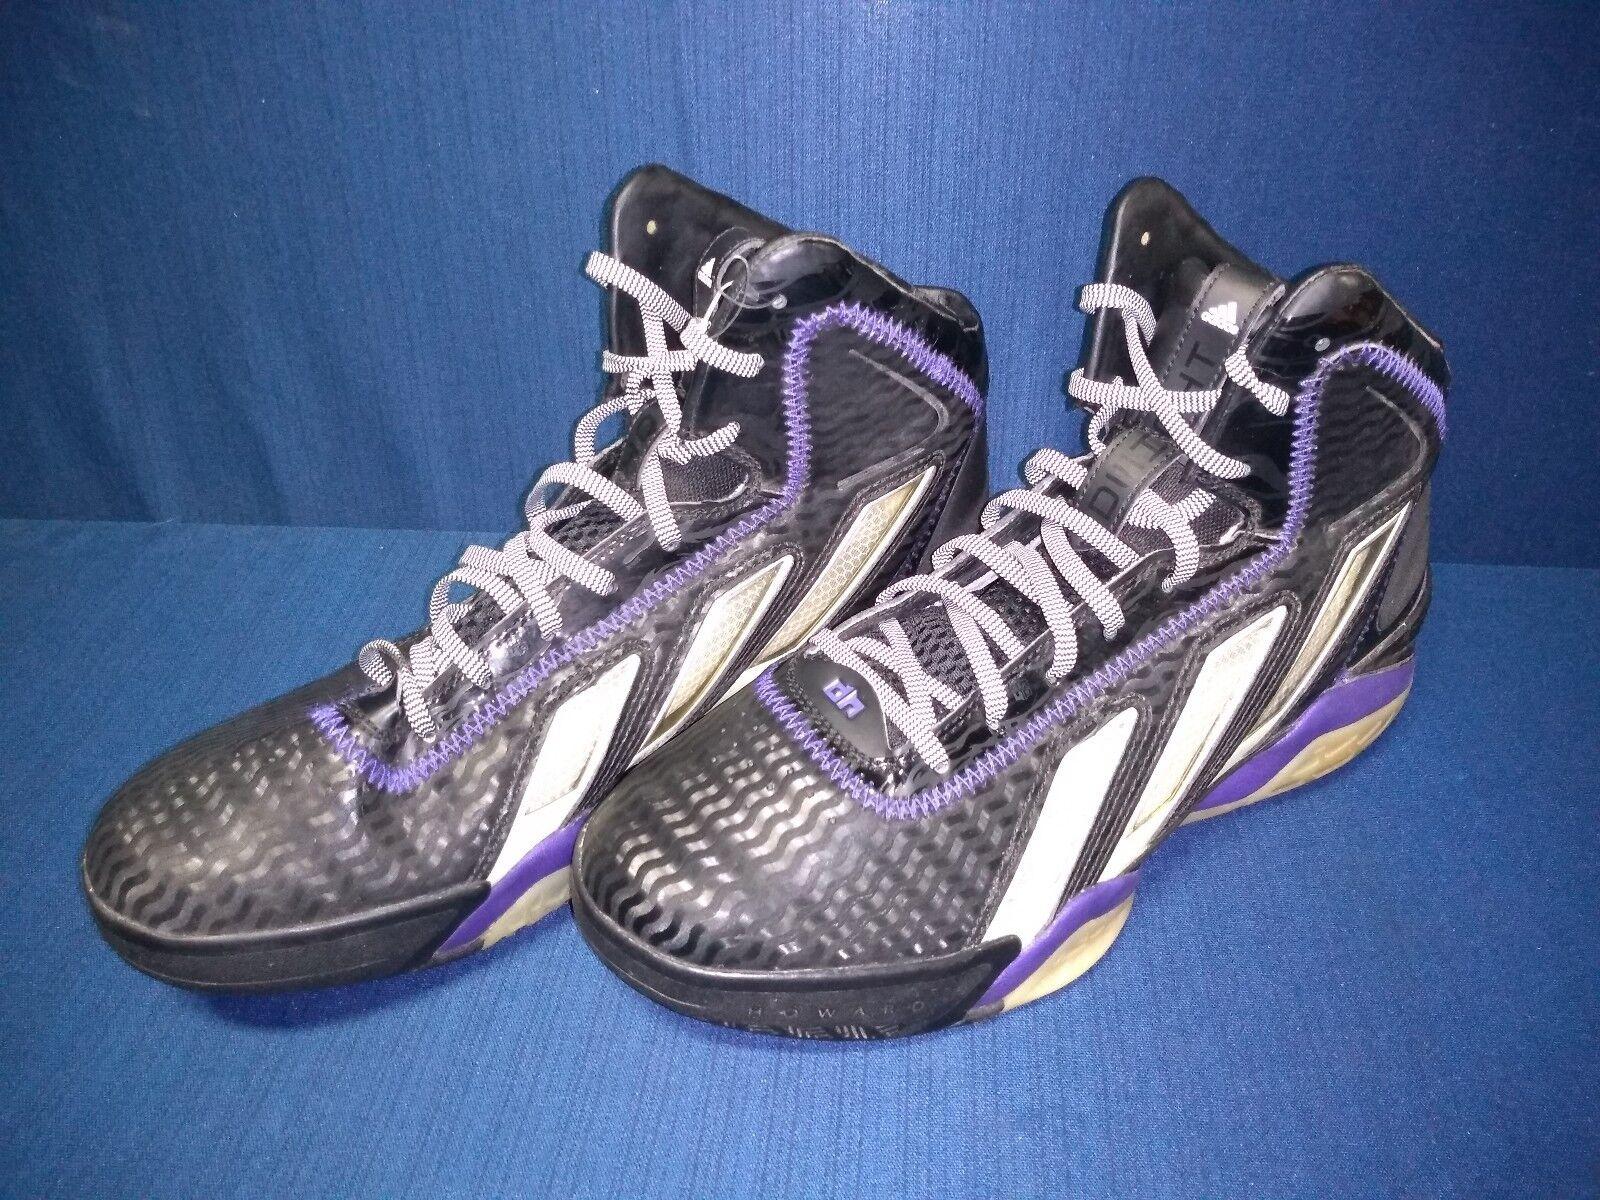 Adidas New Basketball Adipower Howard 3 Men's shoes Size 9 G59693